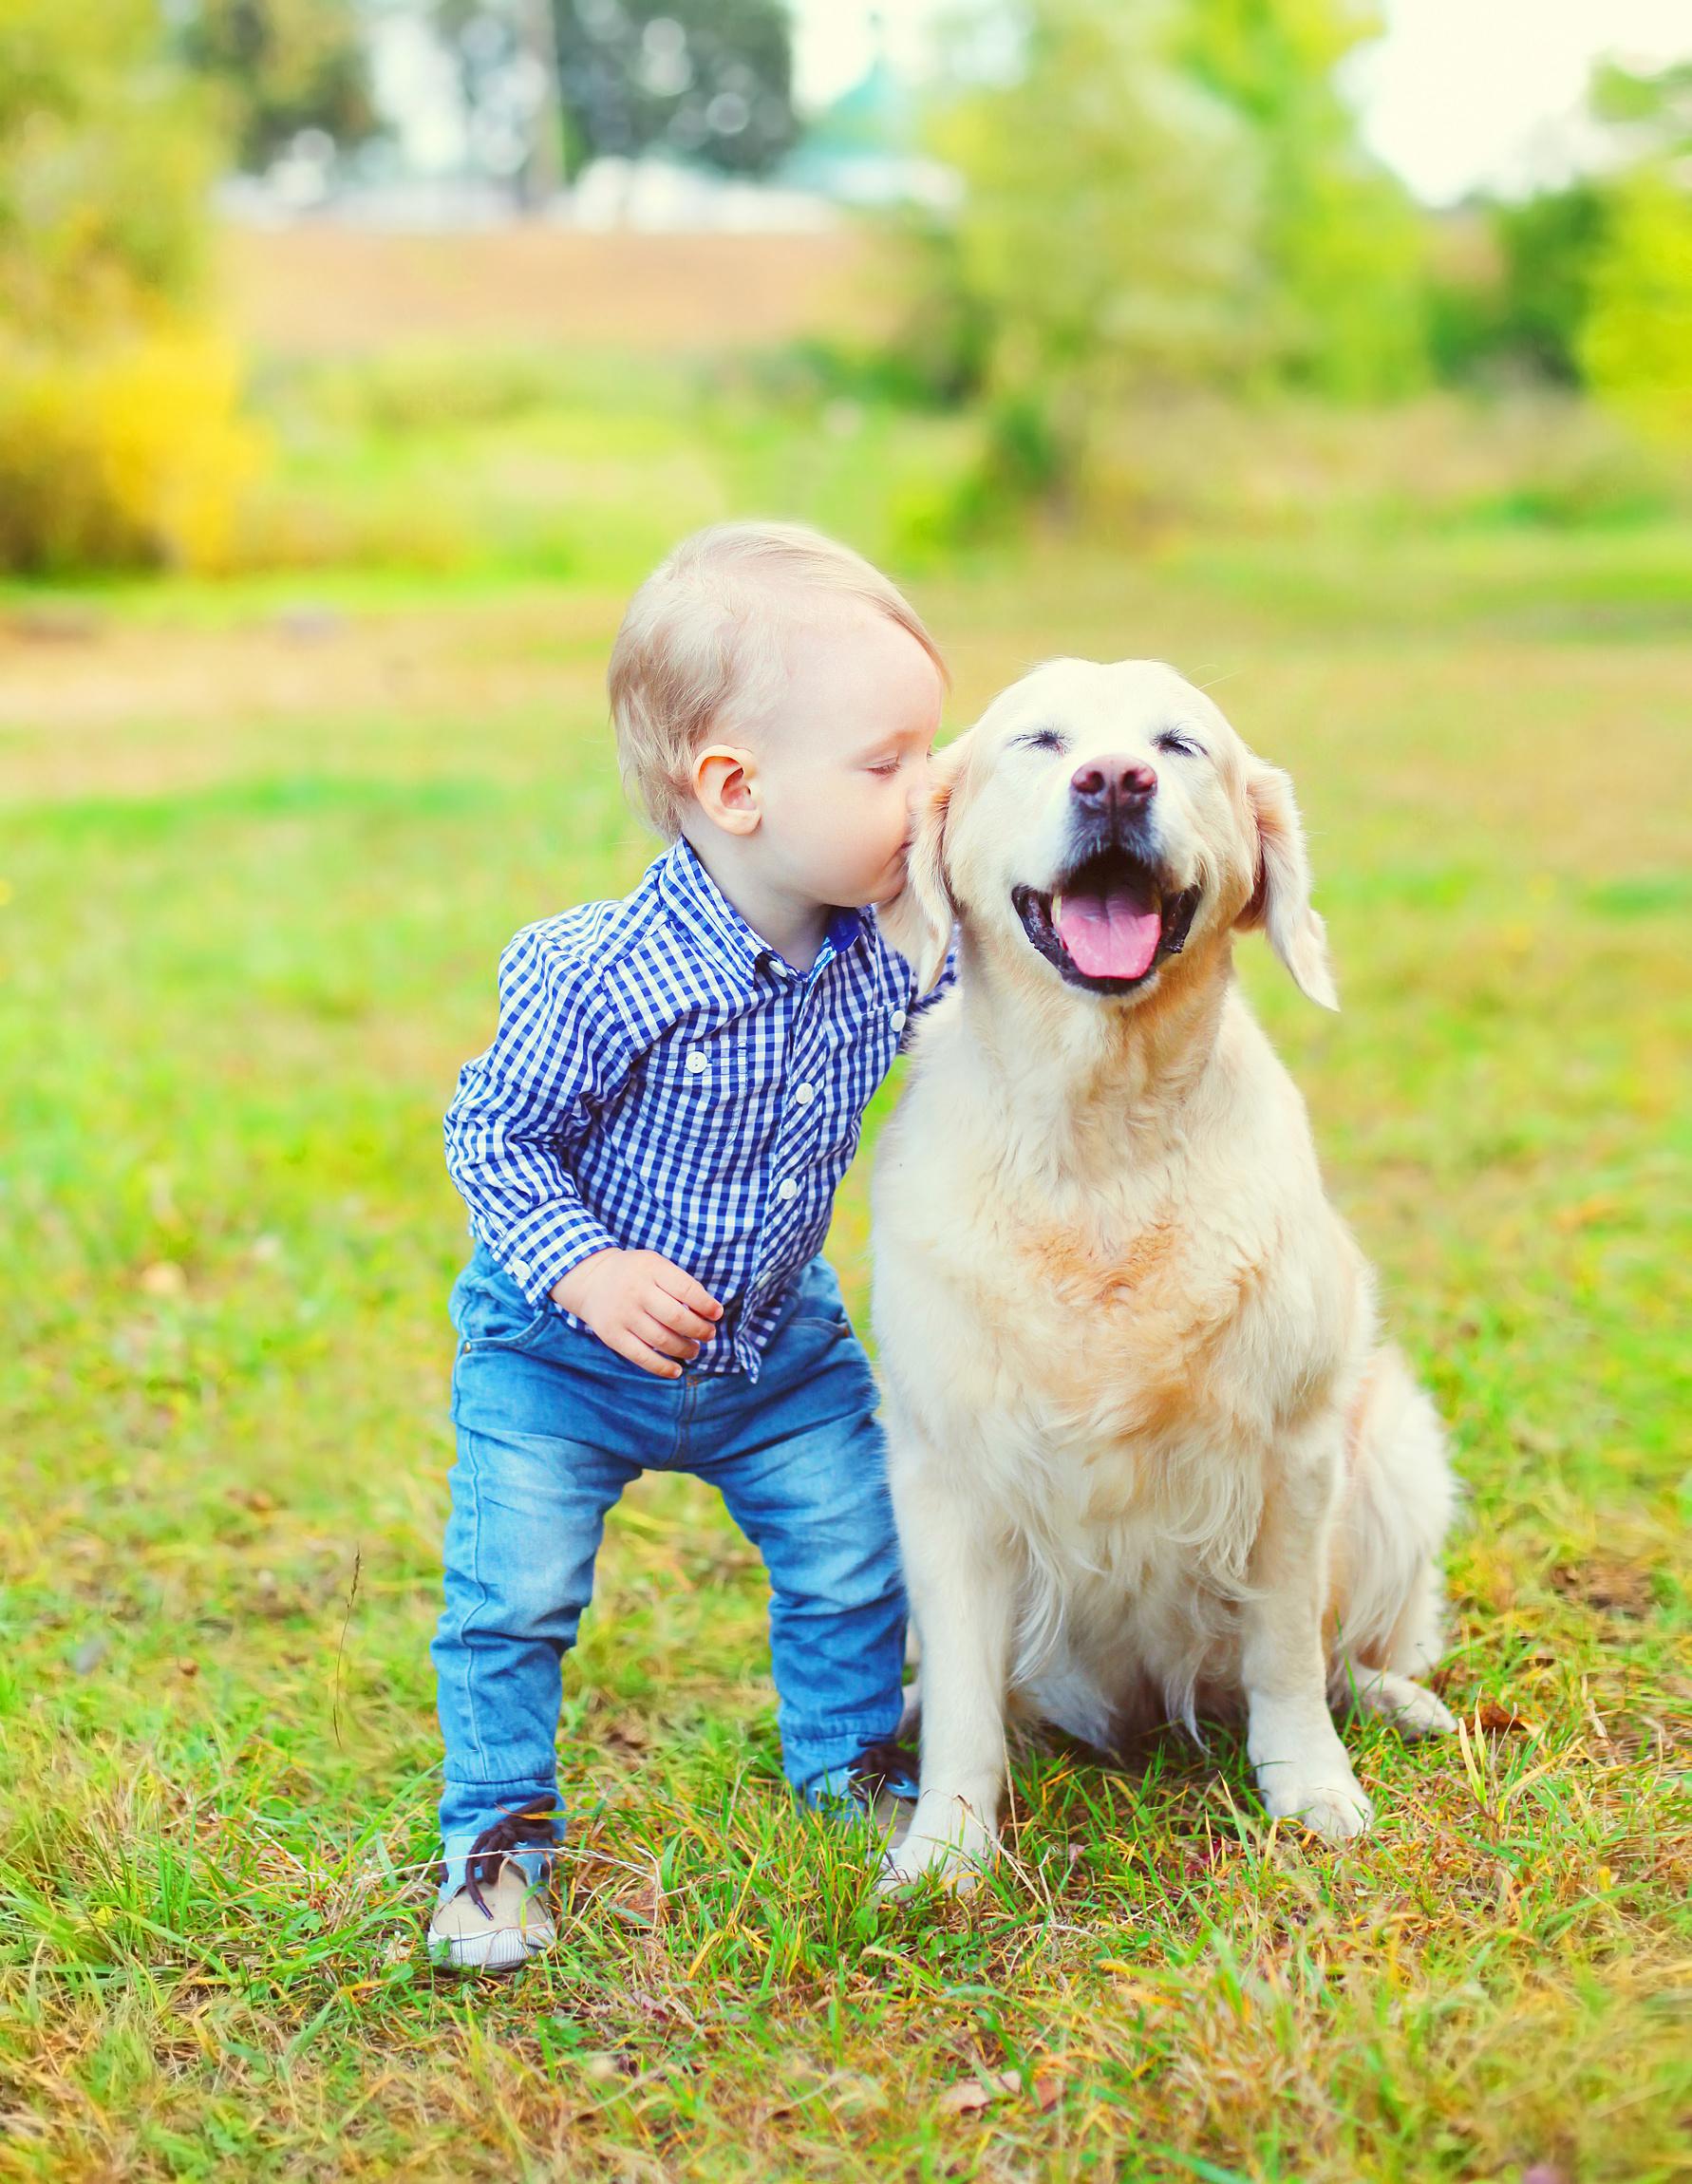 Little boy child kissing Golden Retriever dog on grass in park